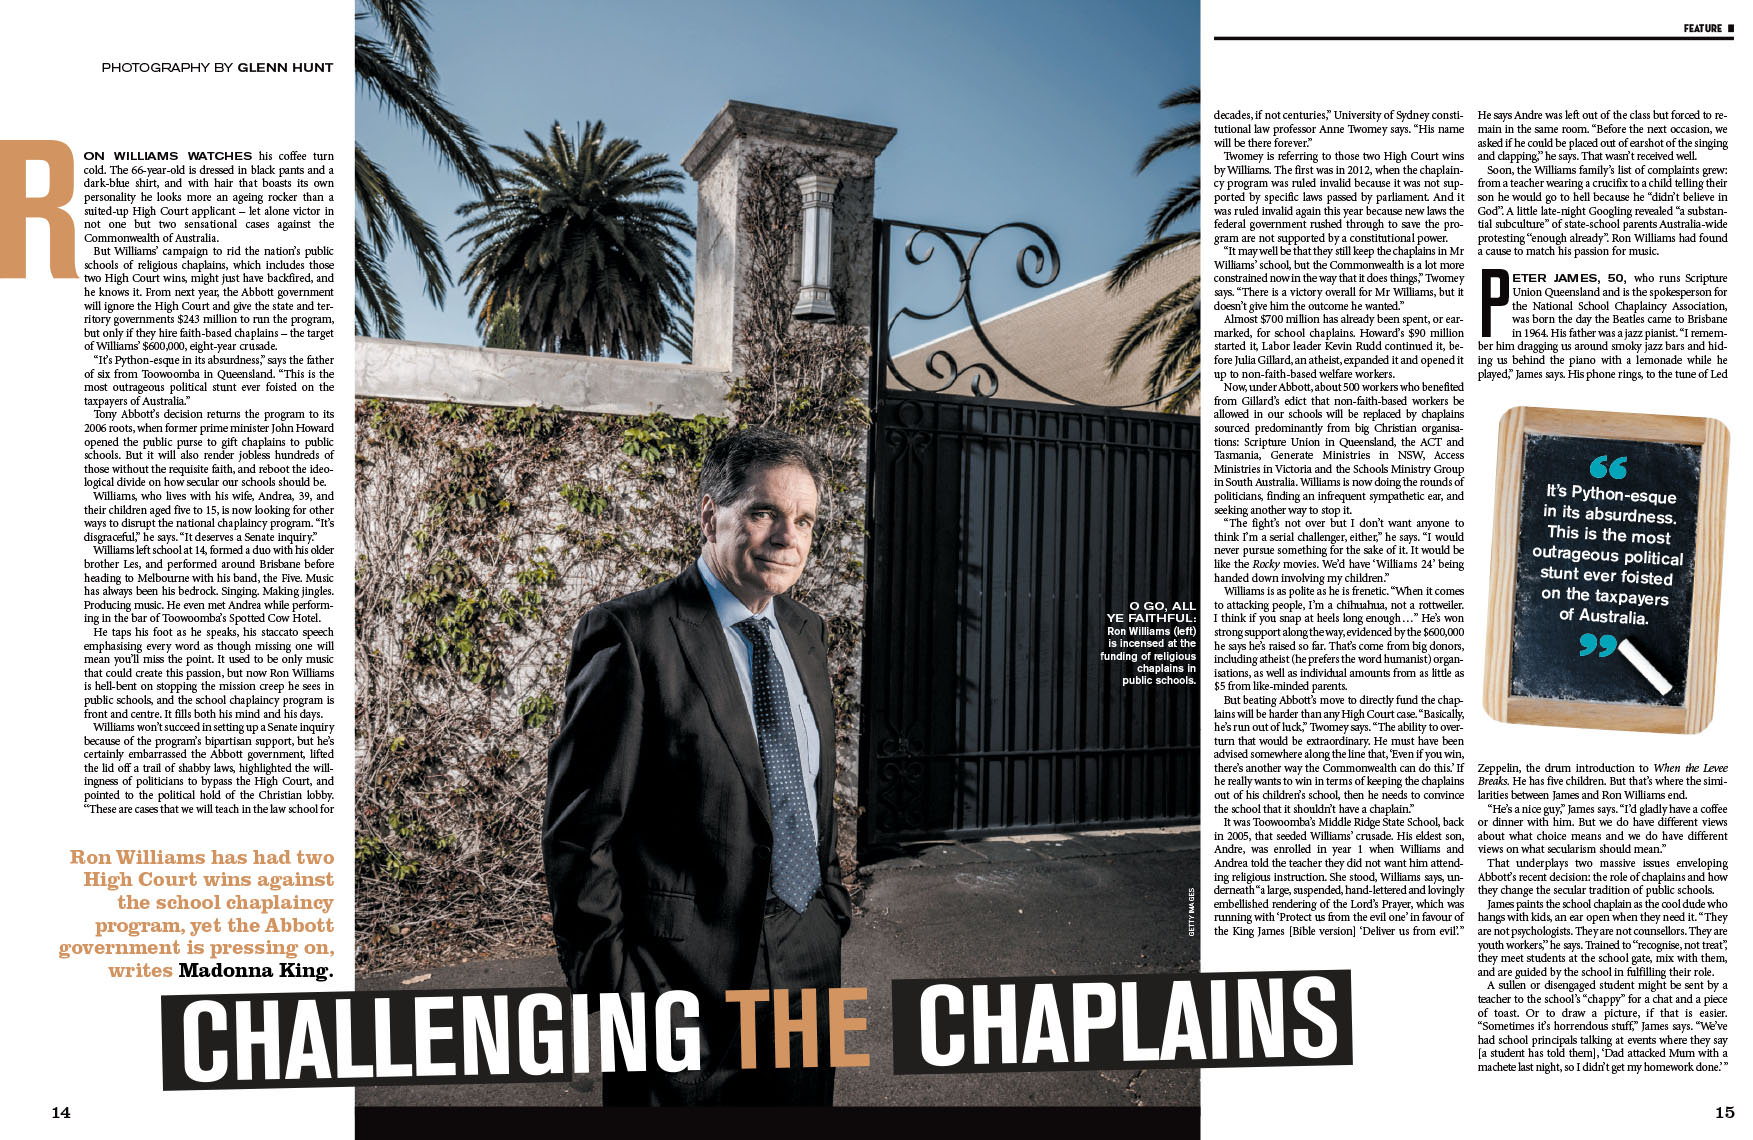 Ron Williams School Chaplains